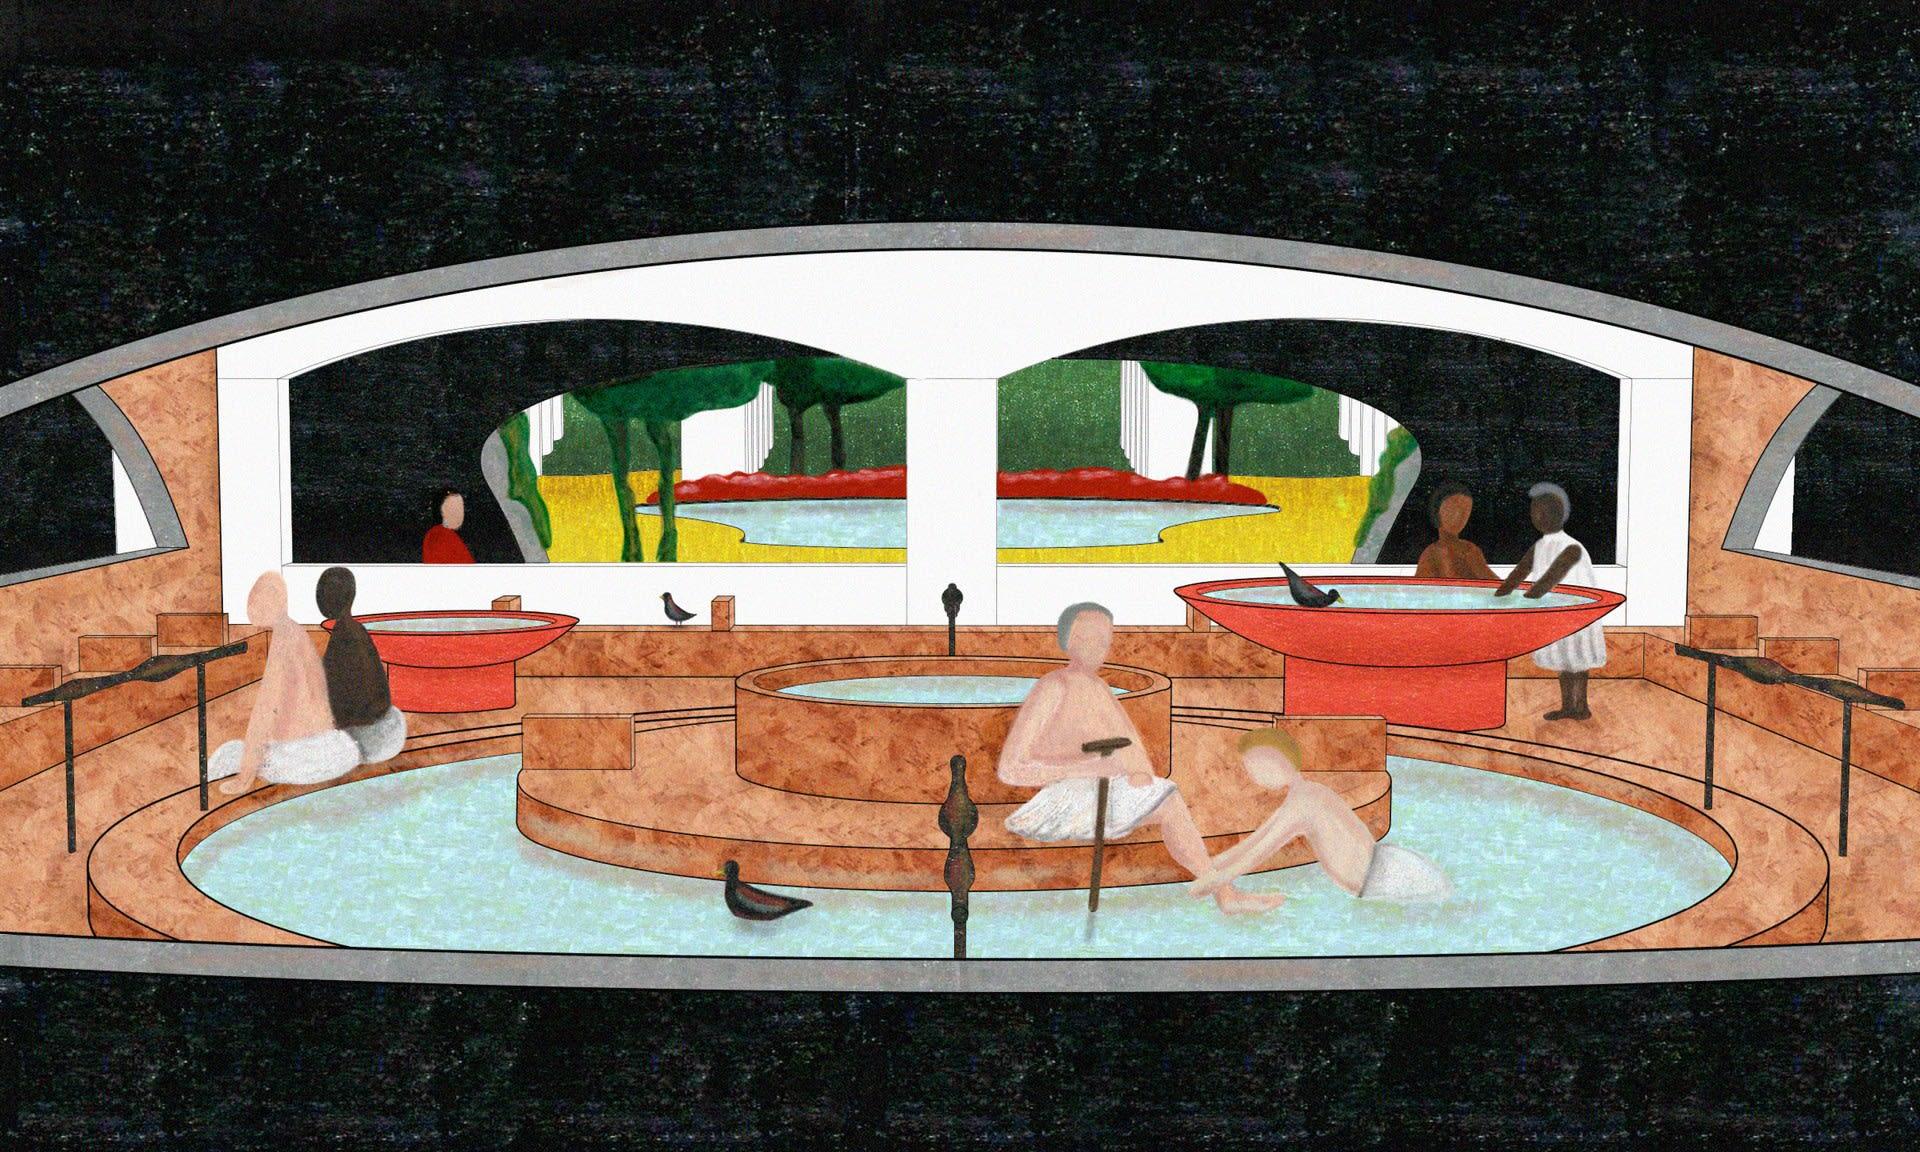 Baths: Washing Feet - Coloured pencil and oil stick on digital print (29.7 x 20 cm)*